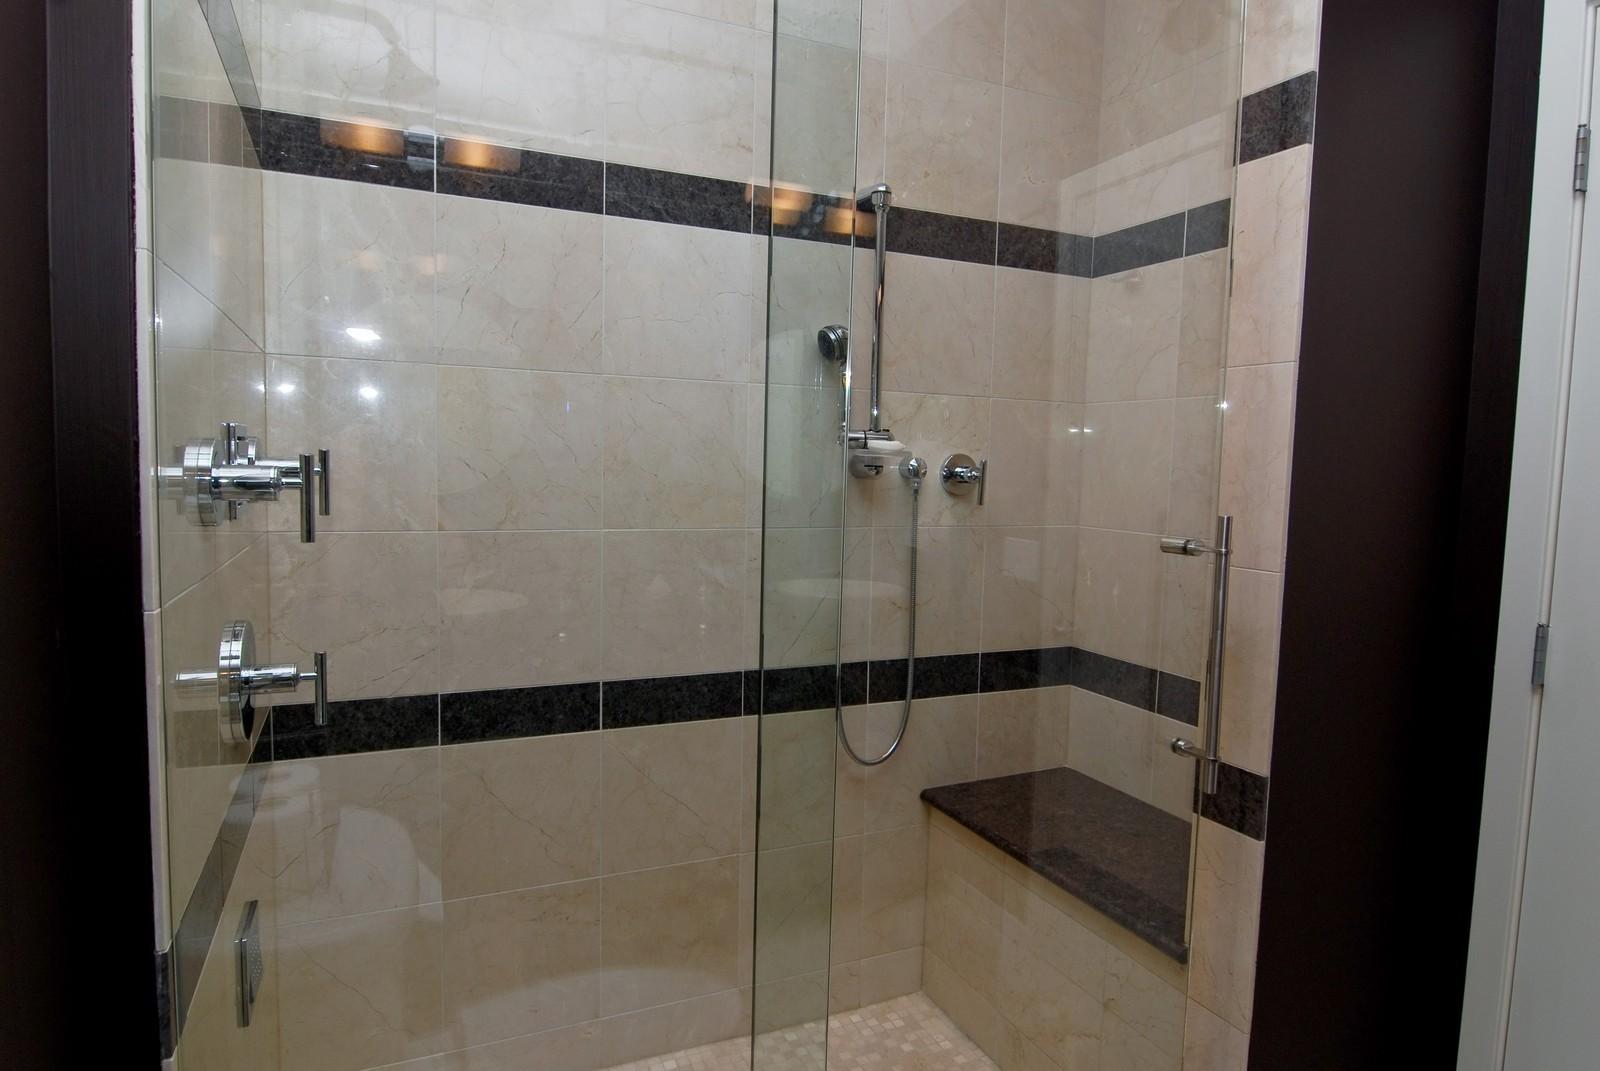 Real Estate Photography - 616 W Fulton, Unit 702, Chicago, IL, 60661 - Master Bathroom